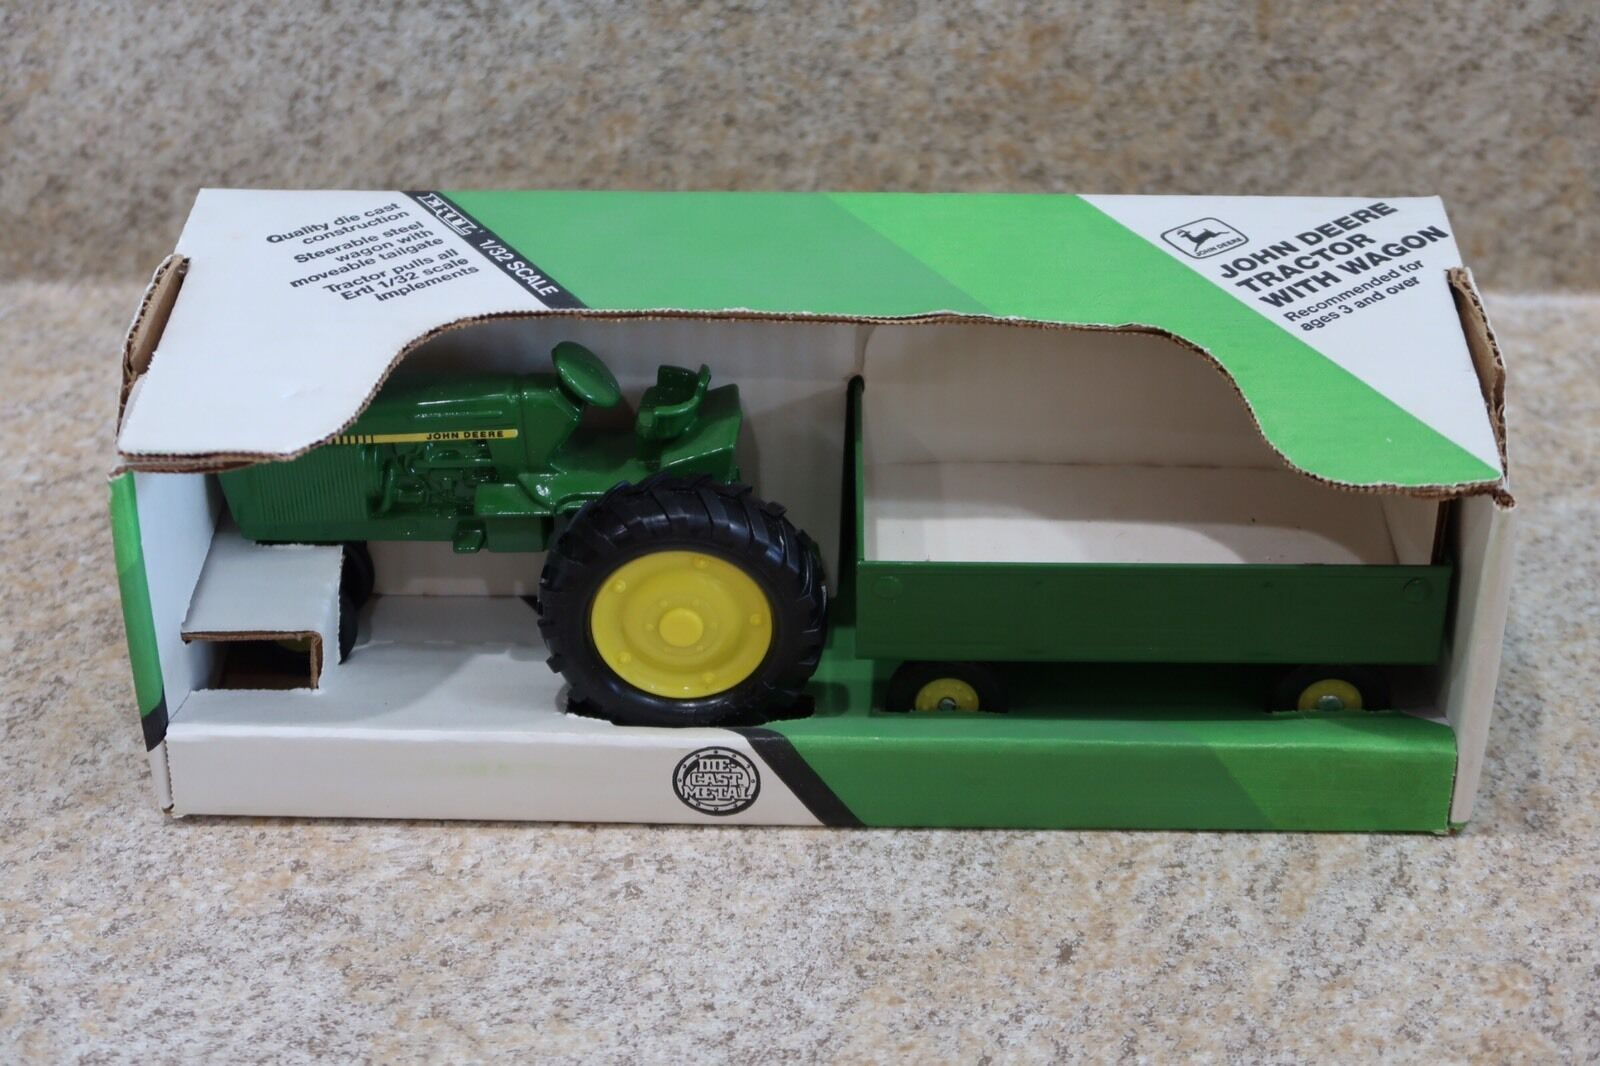 ERTL John Deere Tractor & Wagon 1 32 Farm Play Set Toy New In Box